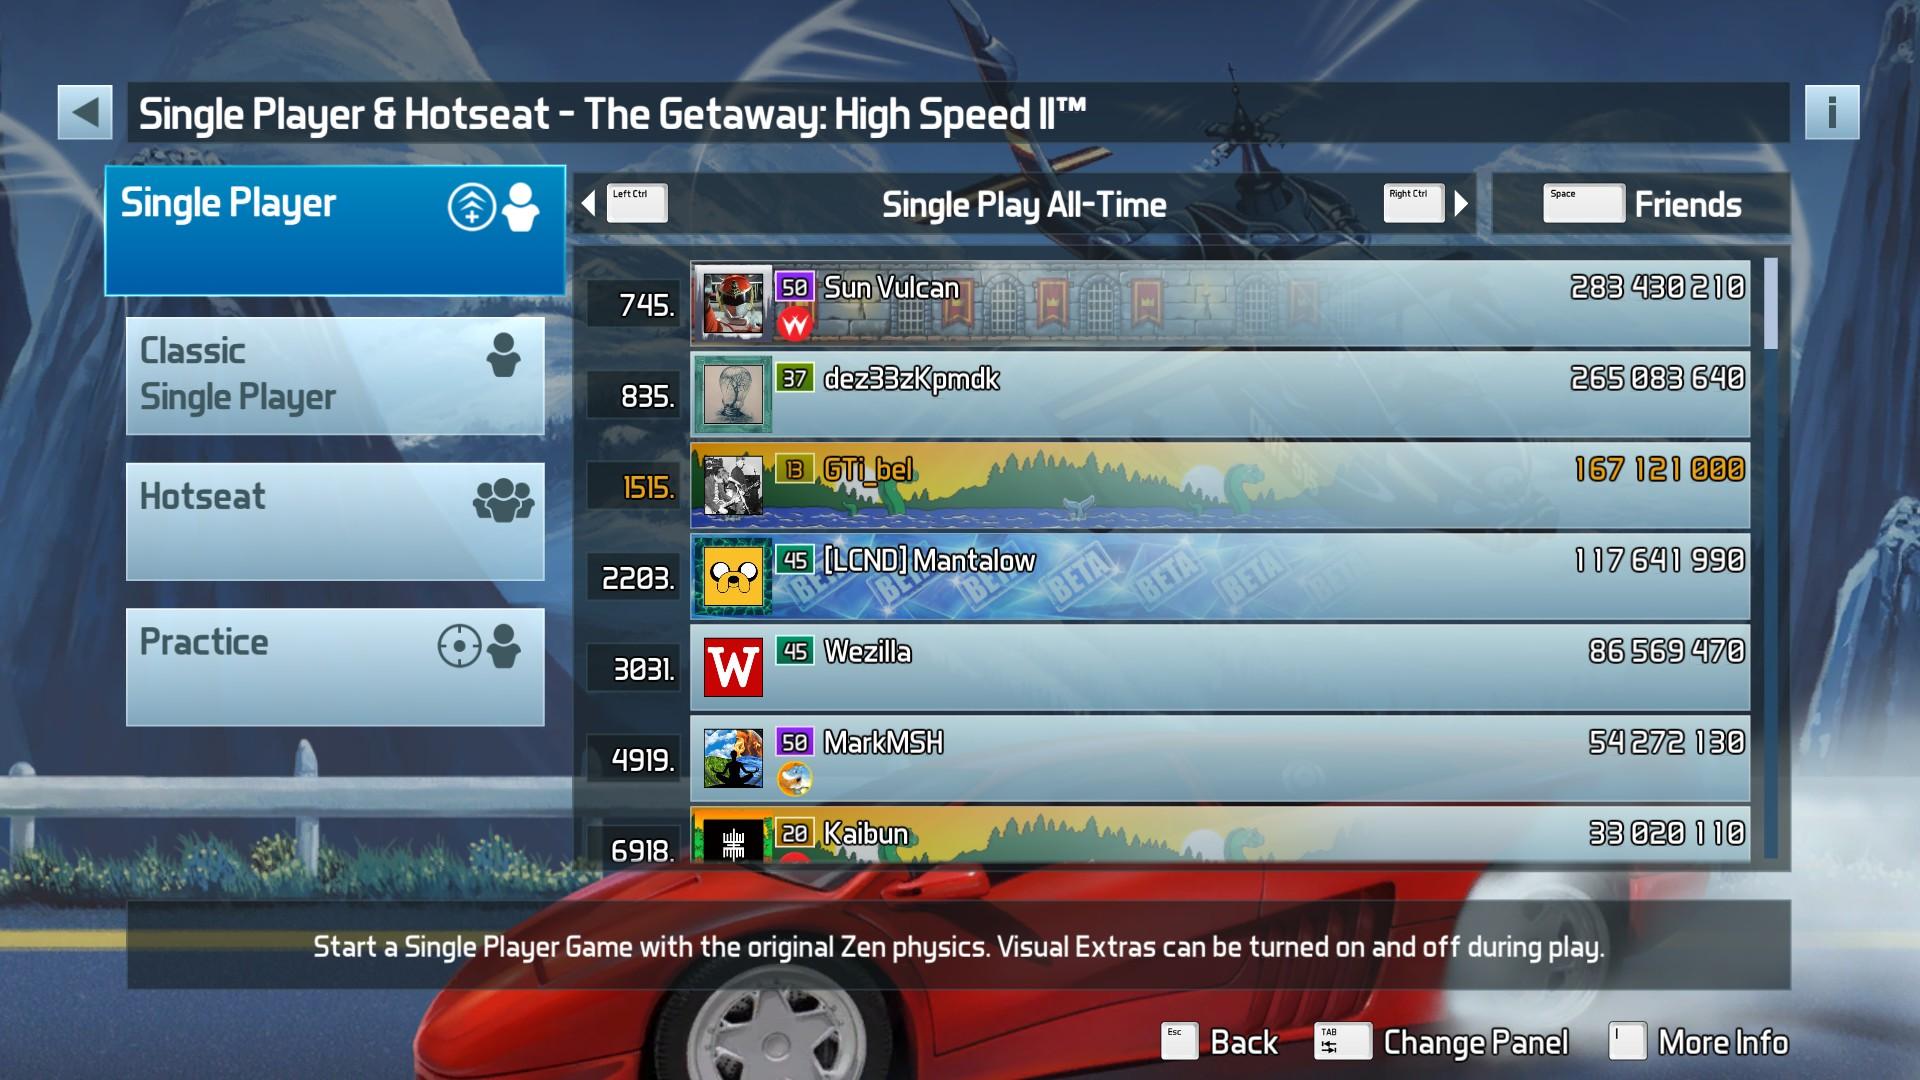 GTibel: Pinball FX3: The Getaway: High Speed II [Arcade] (PC) 167,121,000 points on 2019-01-22 08:14:00